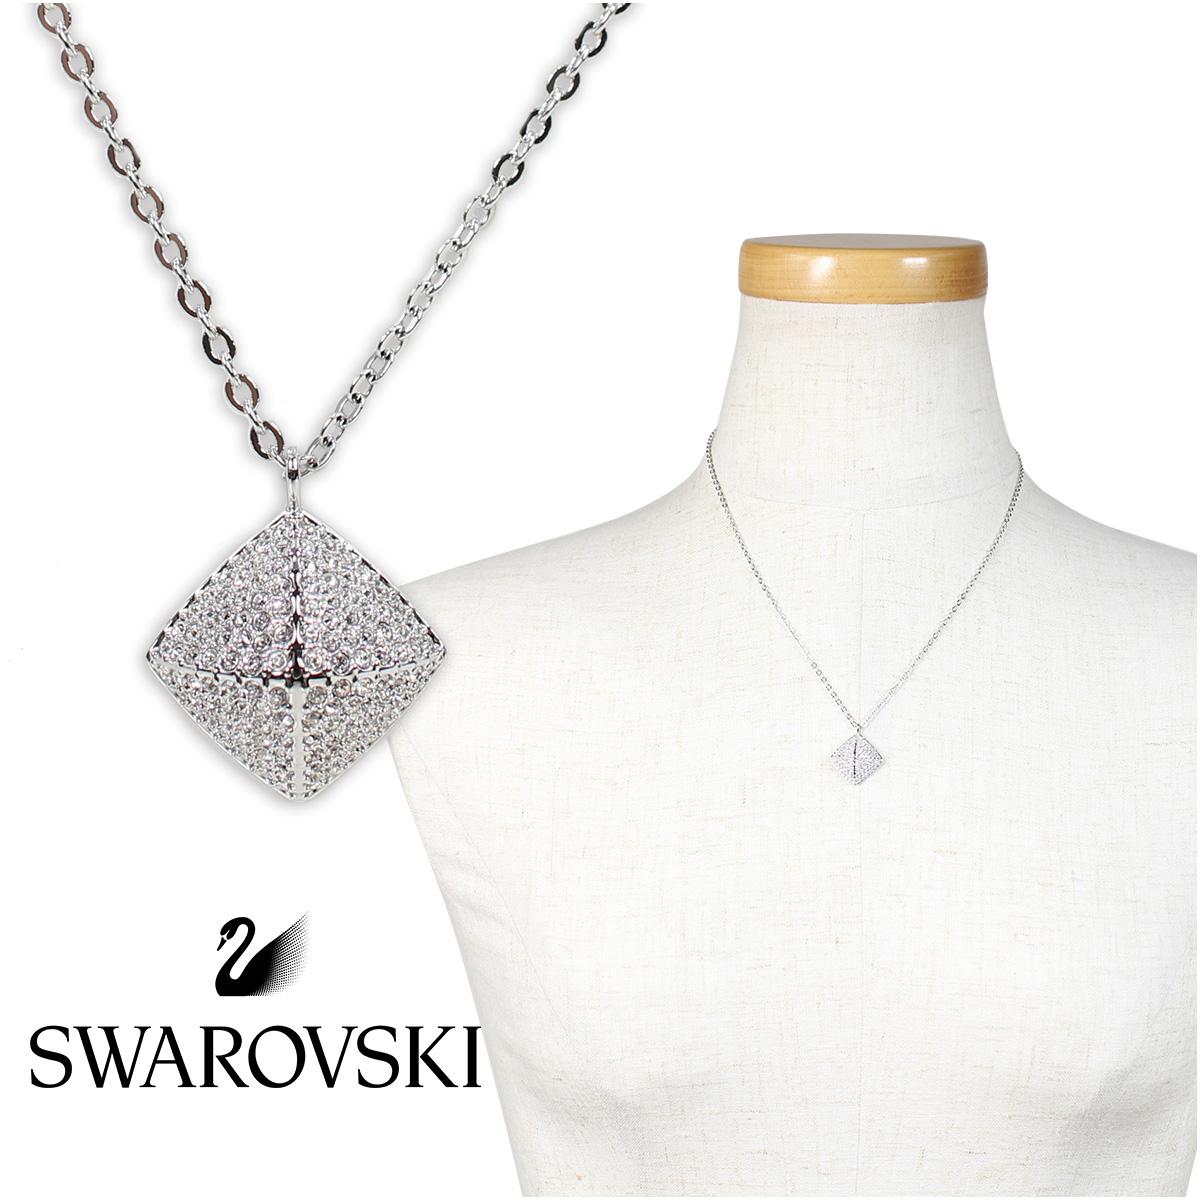 SWAROVSKI スワロフスキー ネックレス レディース TACTIC シルバー 5017069